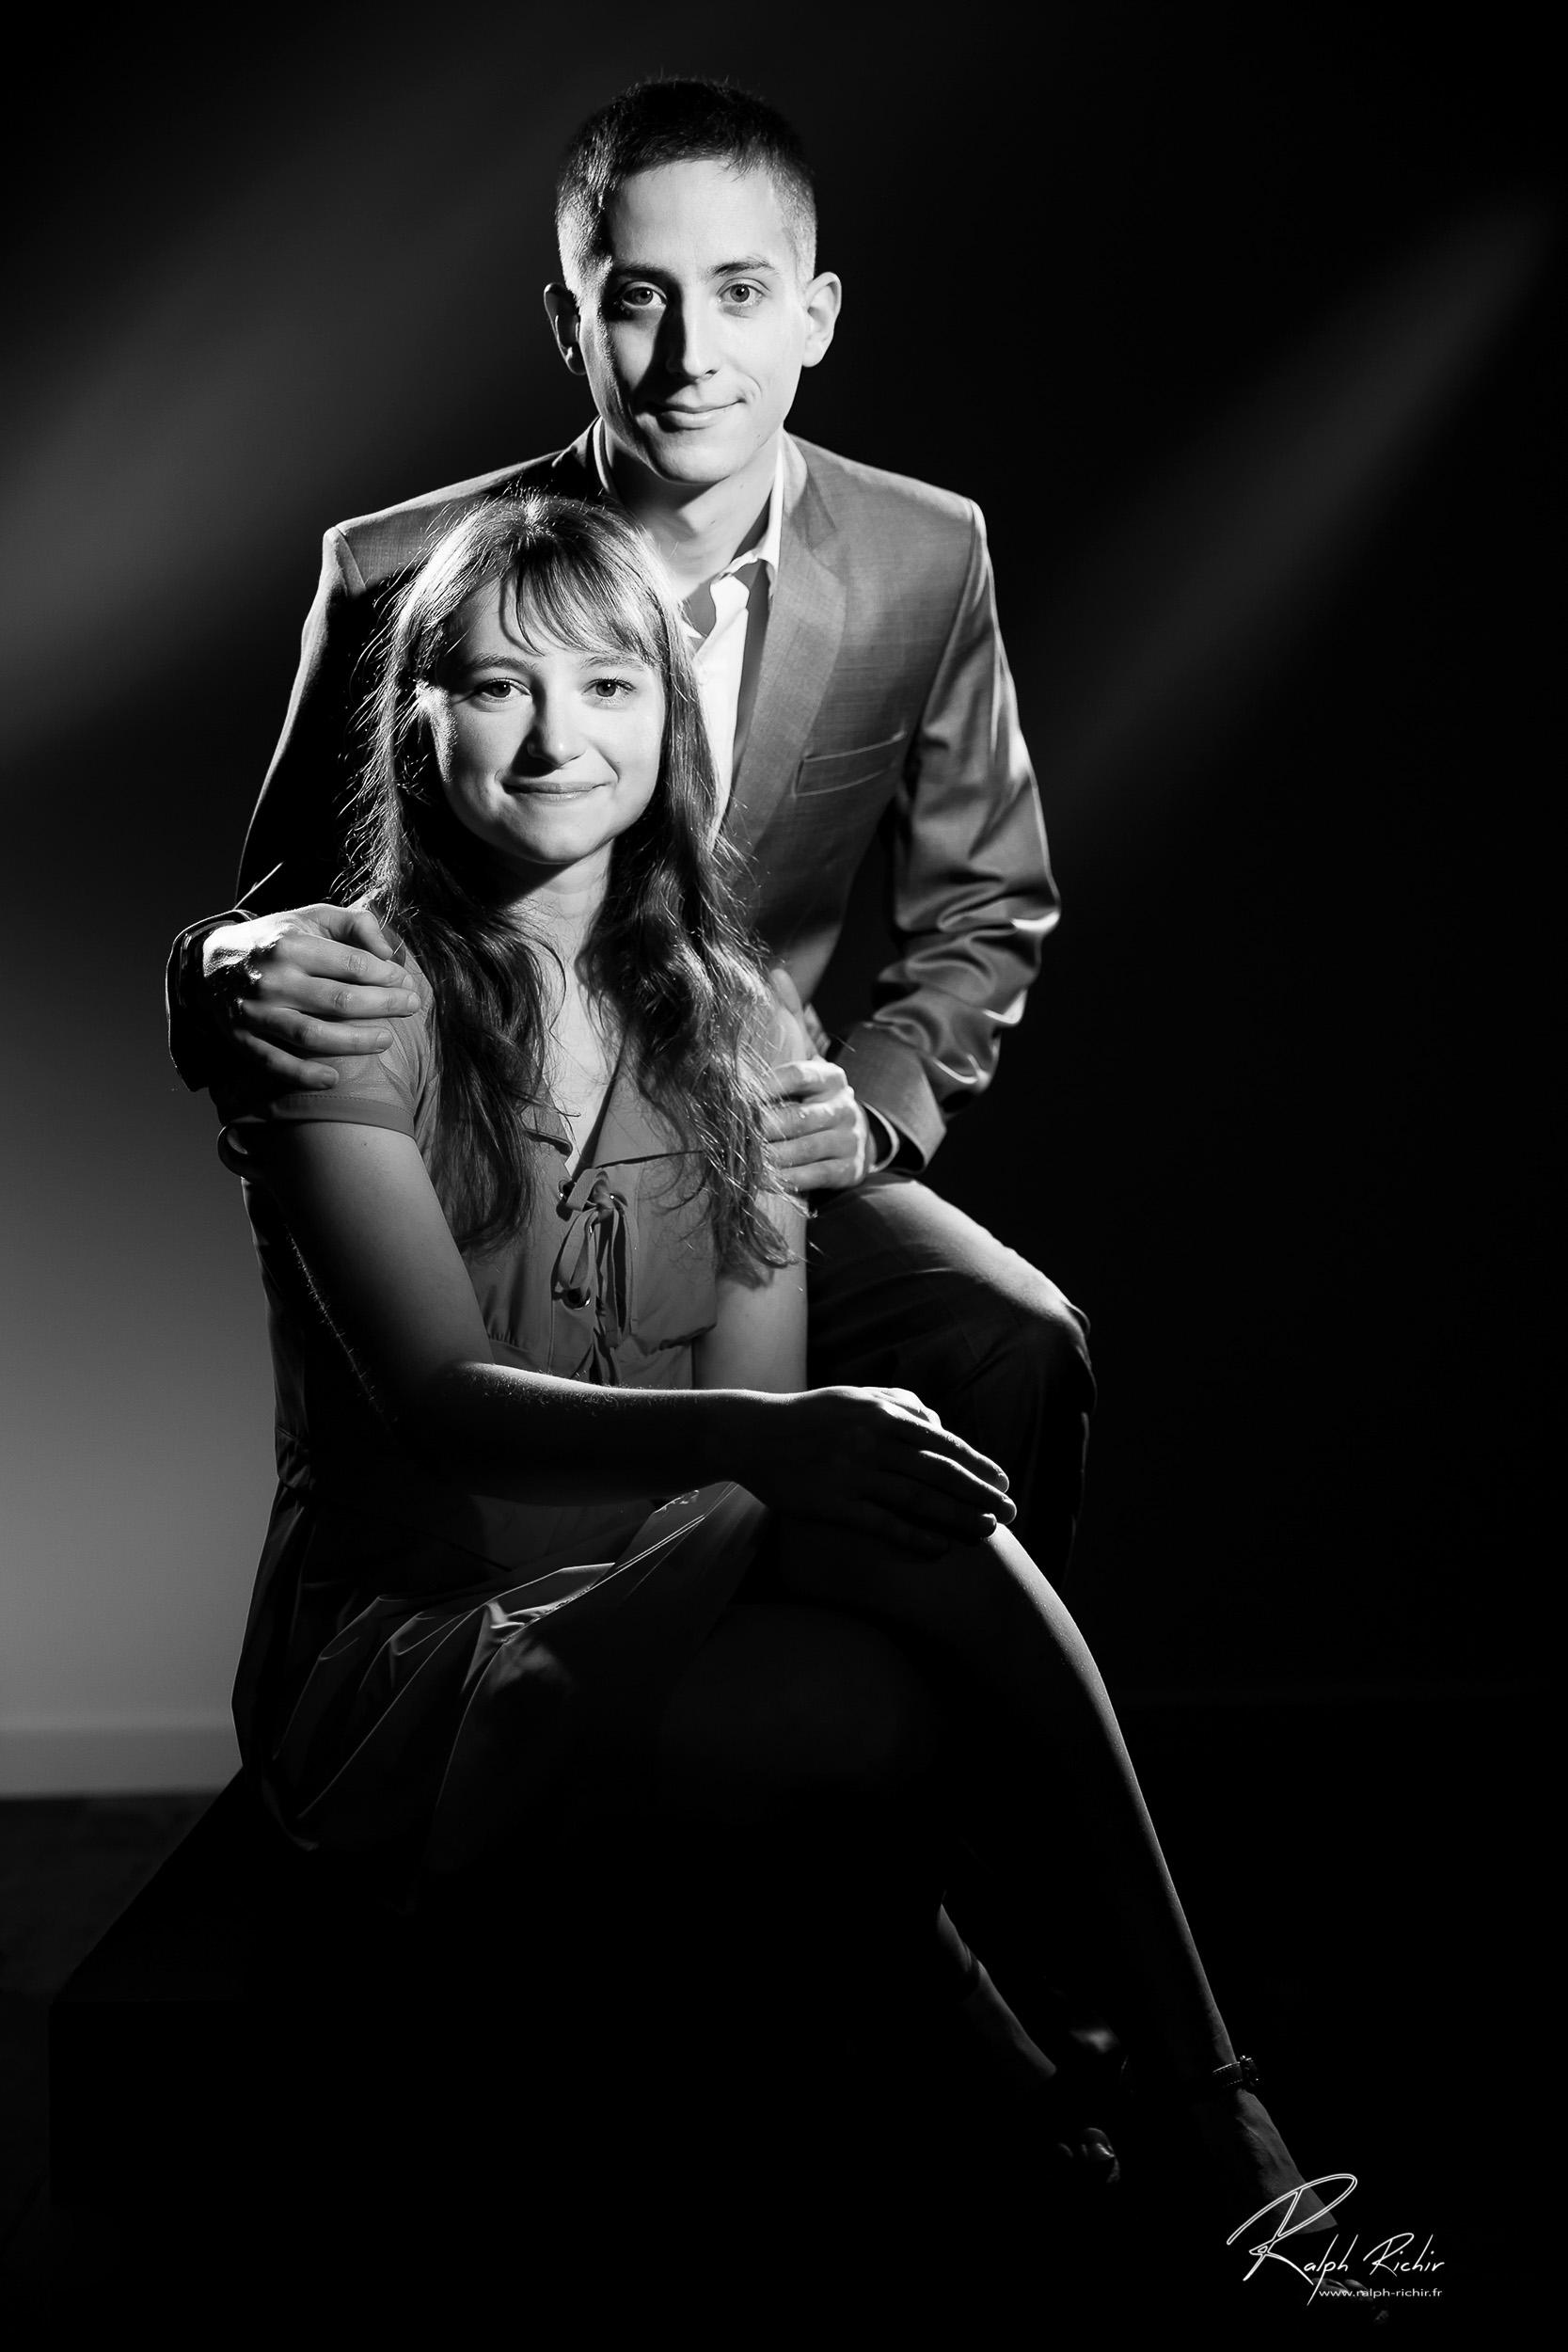 potrtait, photo de couple, studio photo, toulon, galerie ralph richir, www.ralph-richir.fr-6